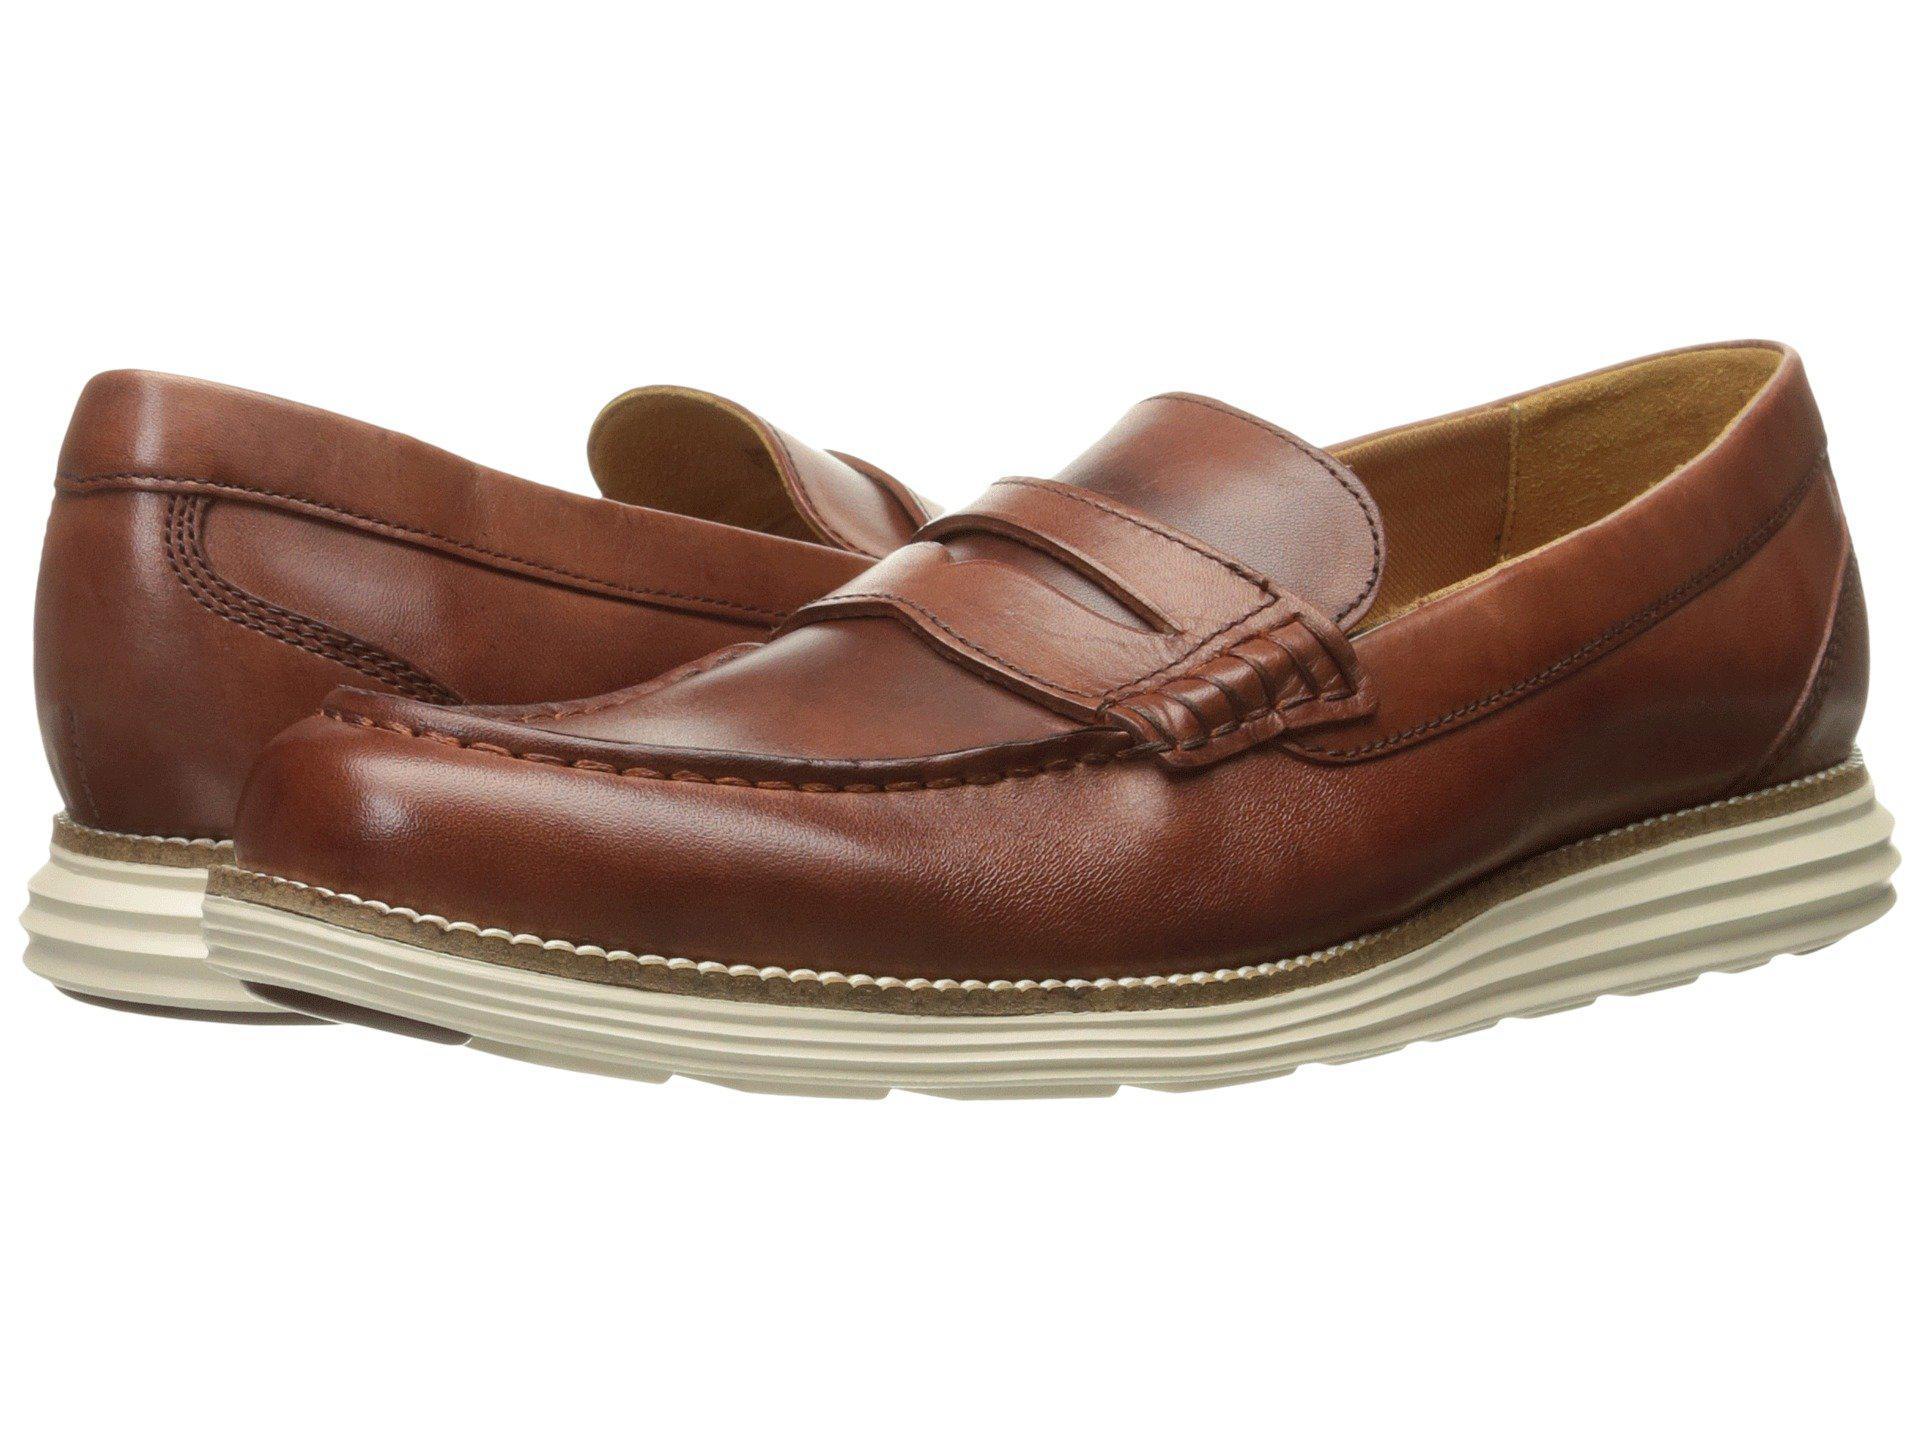 00d238afd06 Lyst - Cole Haan Original Grand Penny Loafer in Brown for Men